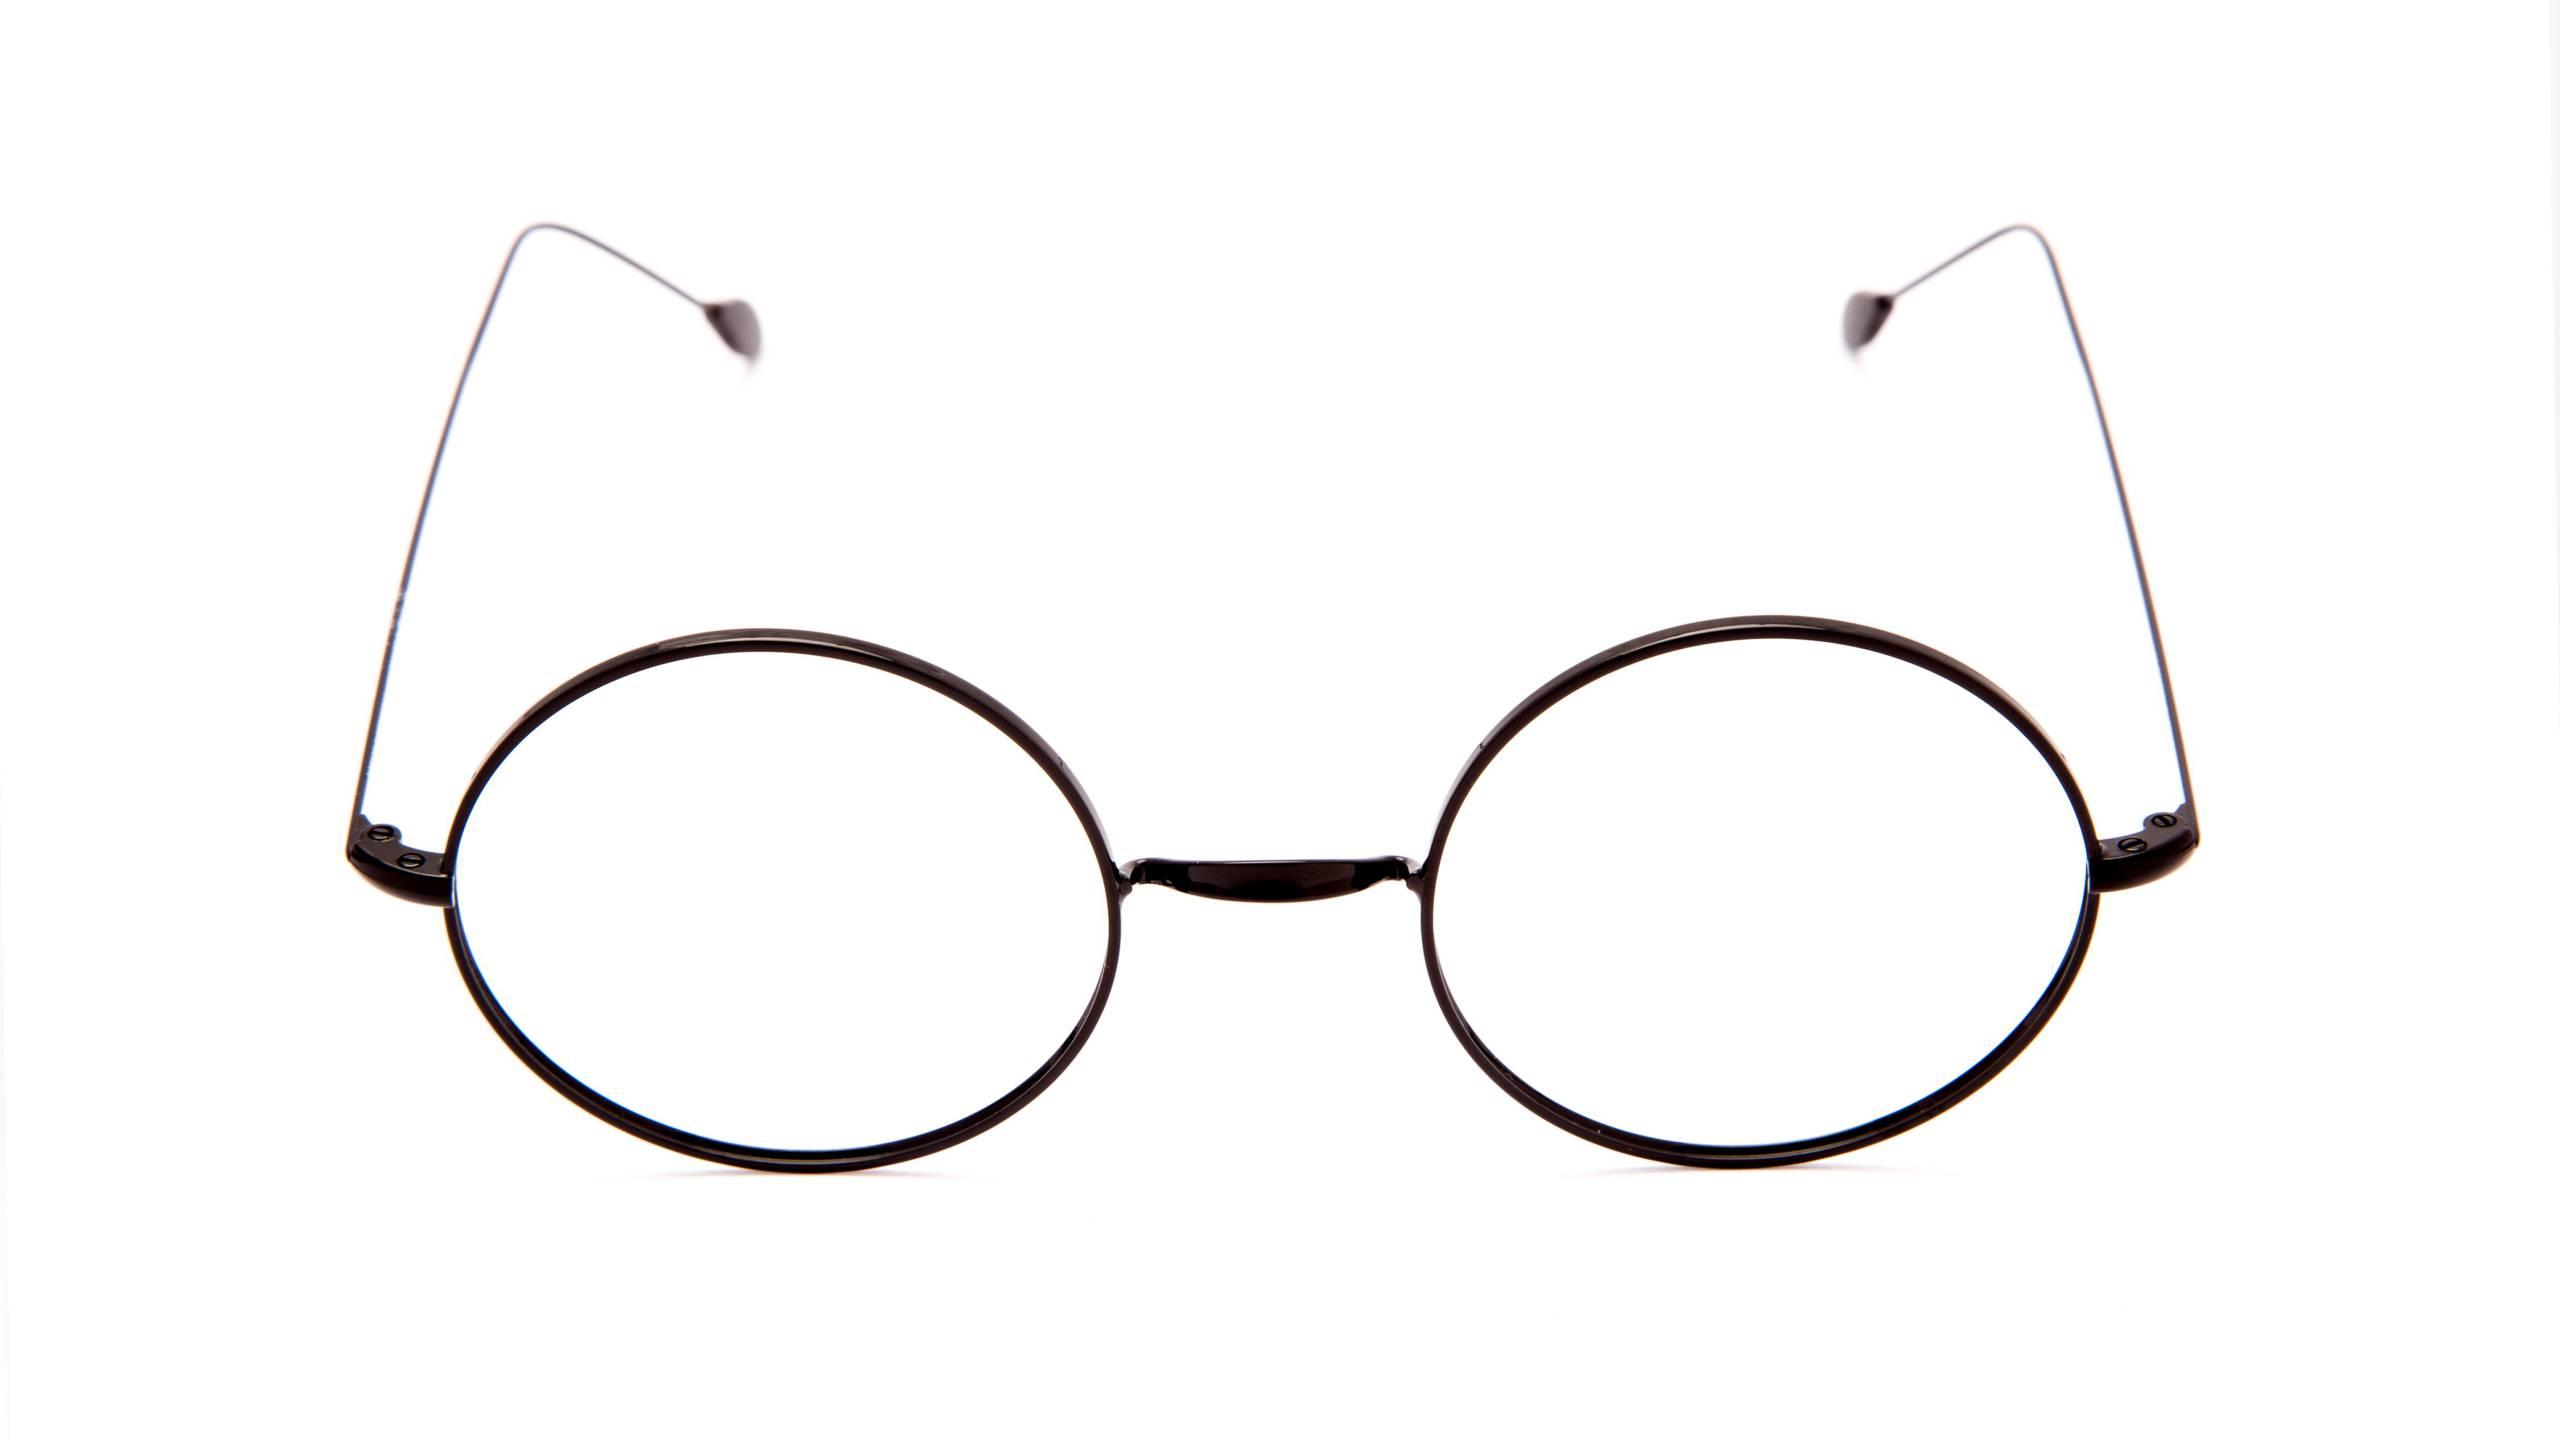 eyeglasses-Nathan-Kaltermann-made-in-Italy-PORTOFINO-NERO-UNI-VISTA1